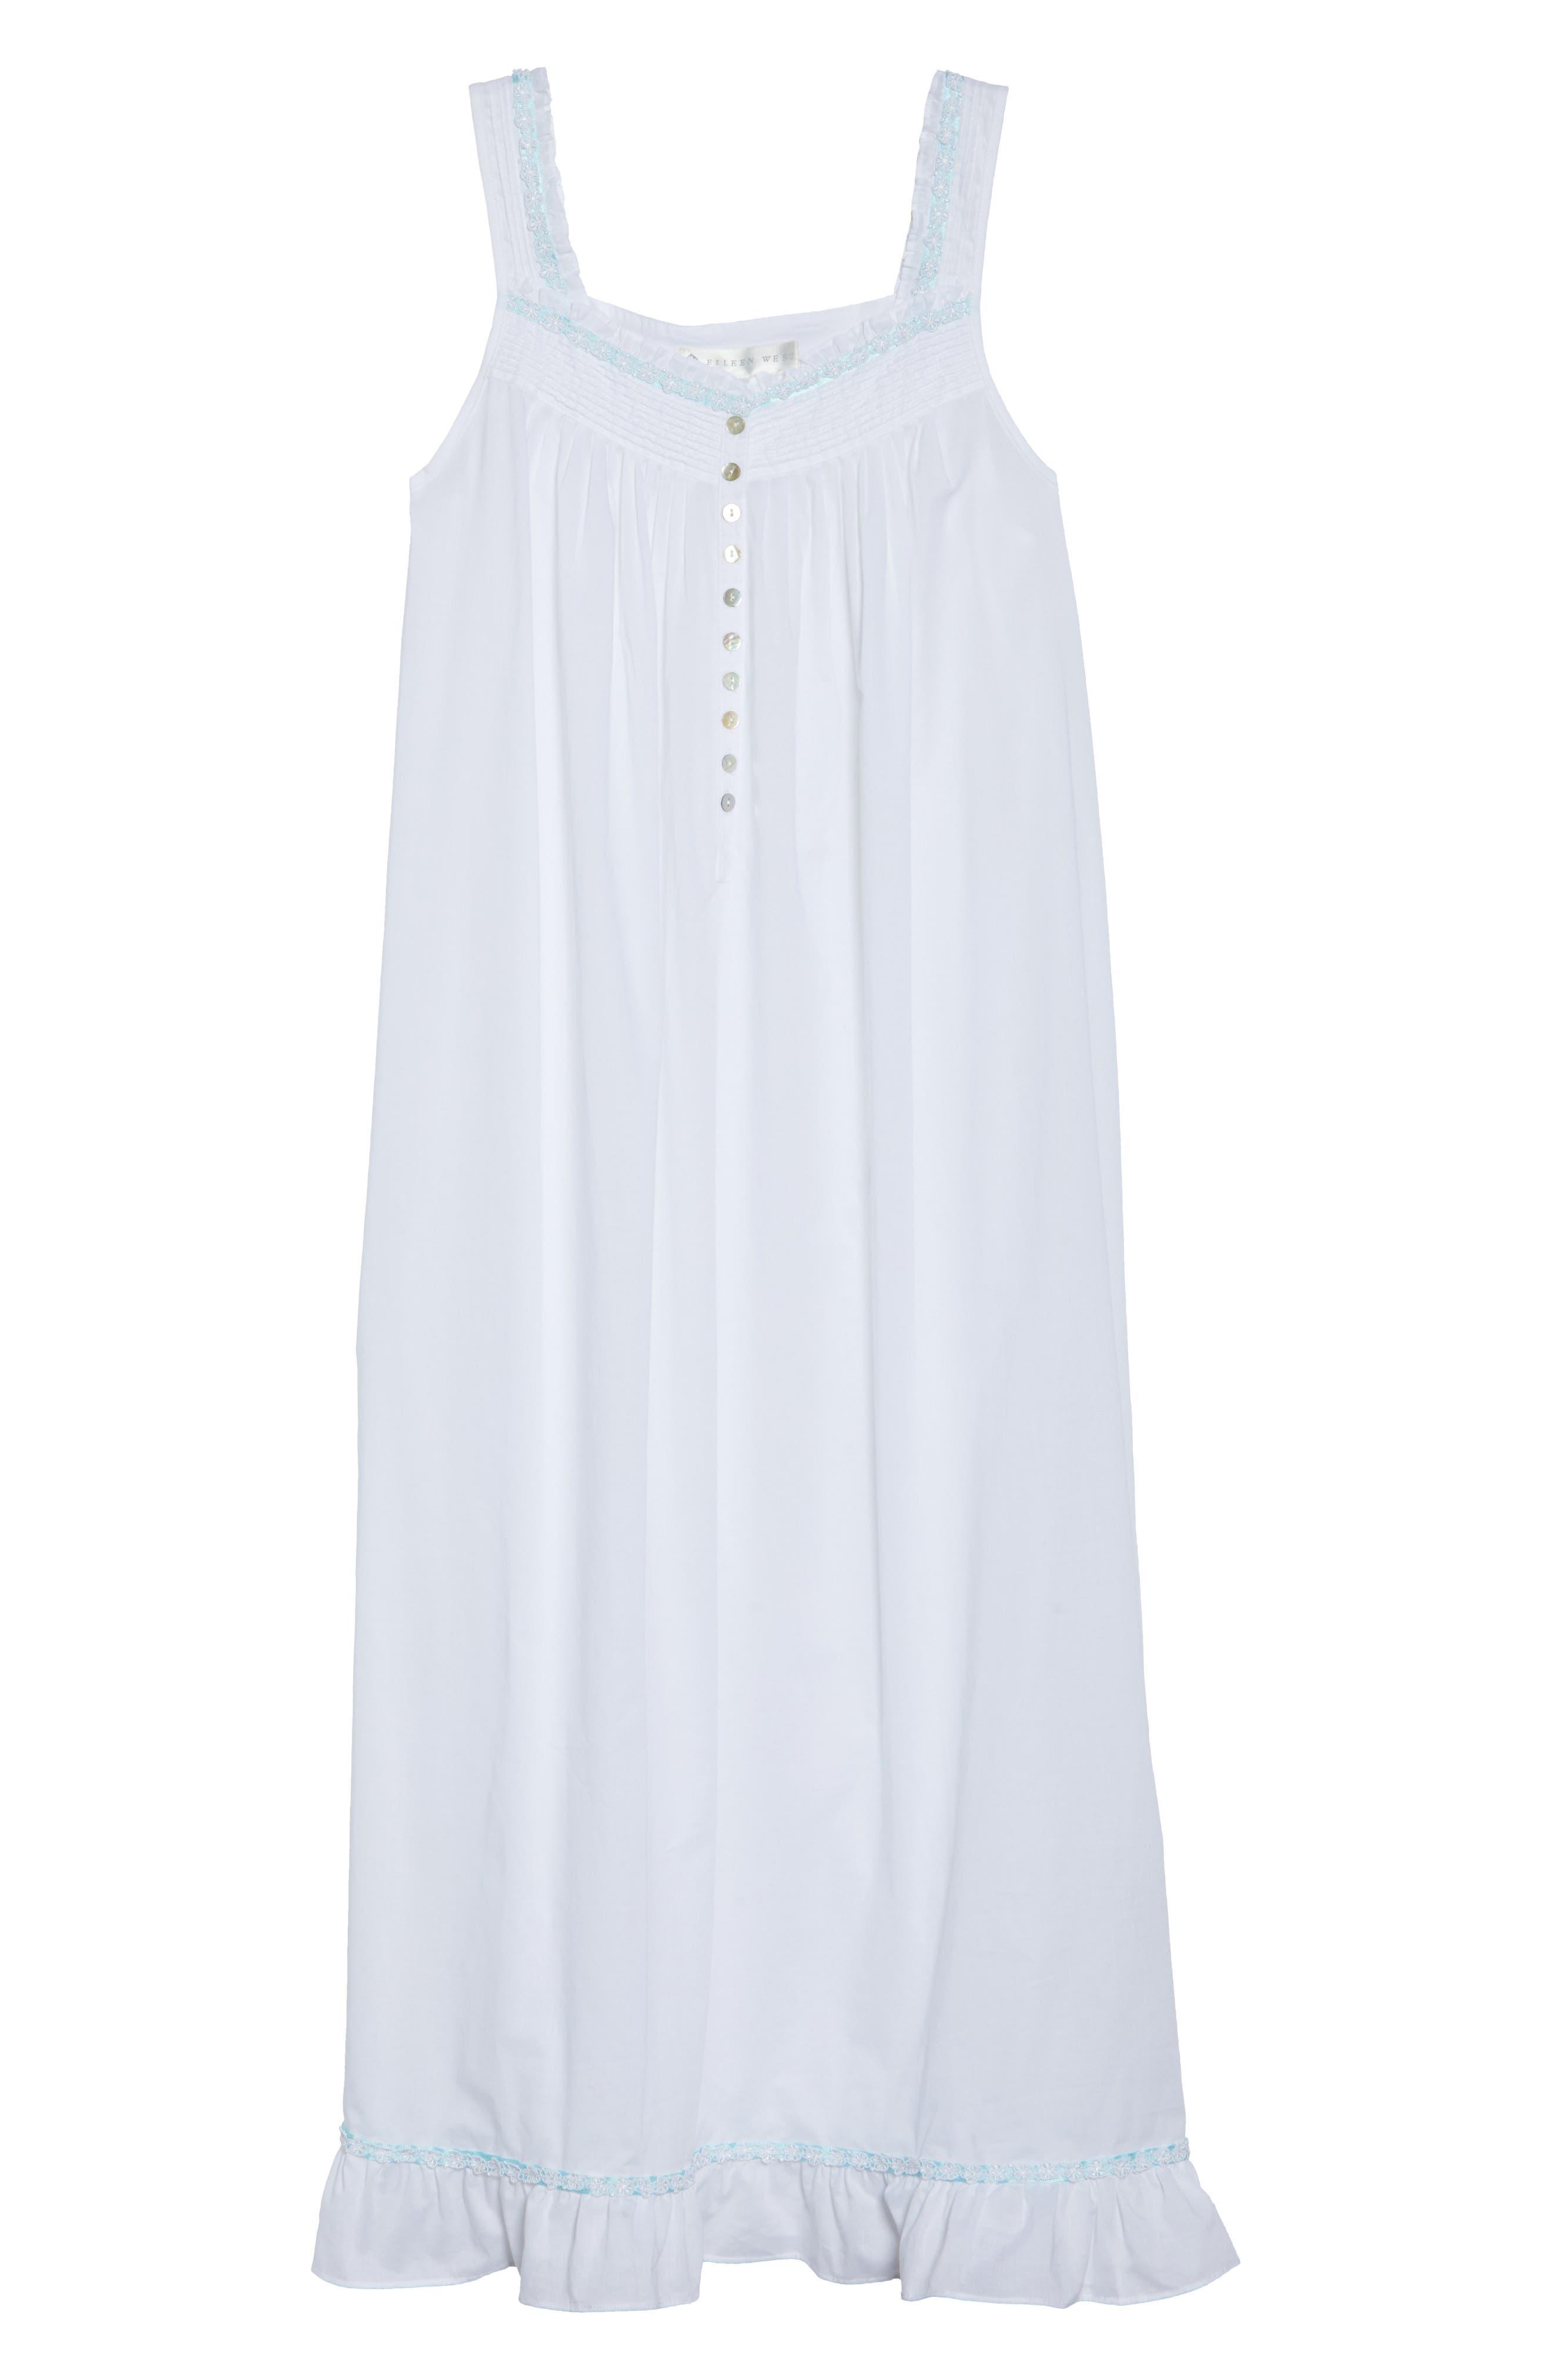 Cotton Lawn Ballet Nightgown,                             Alternate thumbnail 6, color,                             100